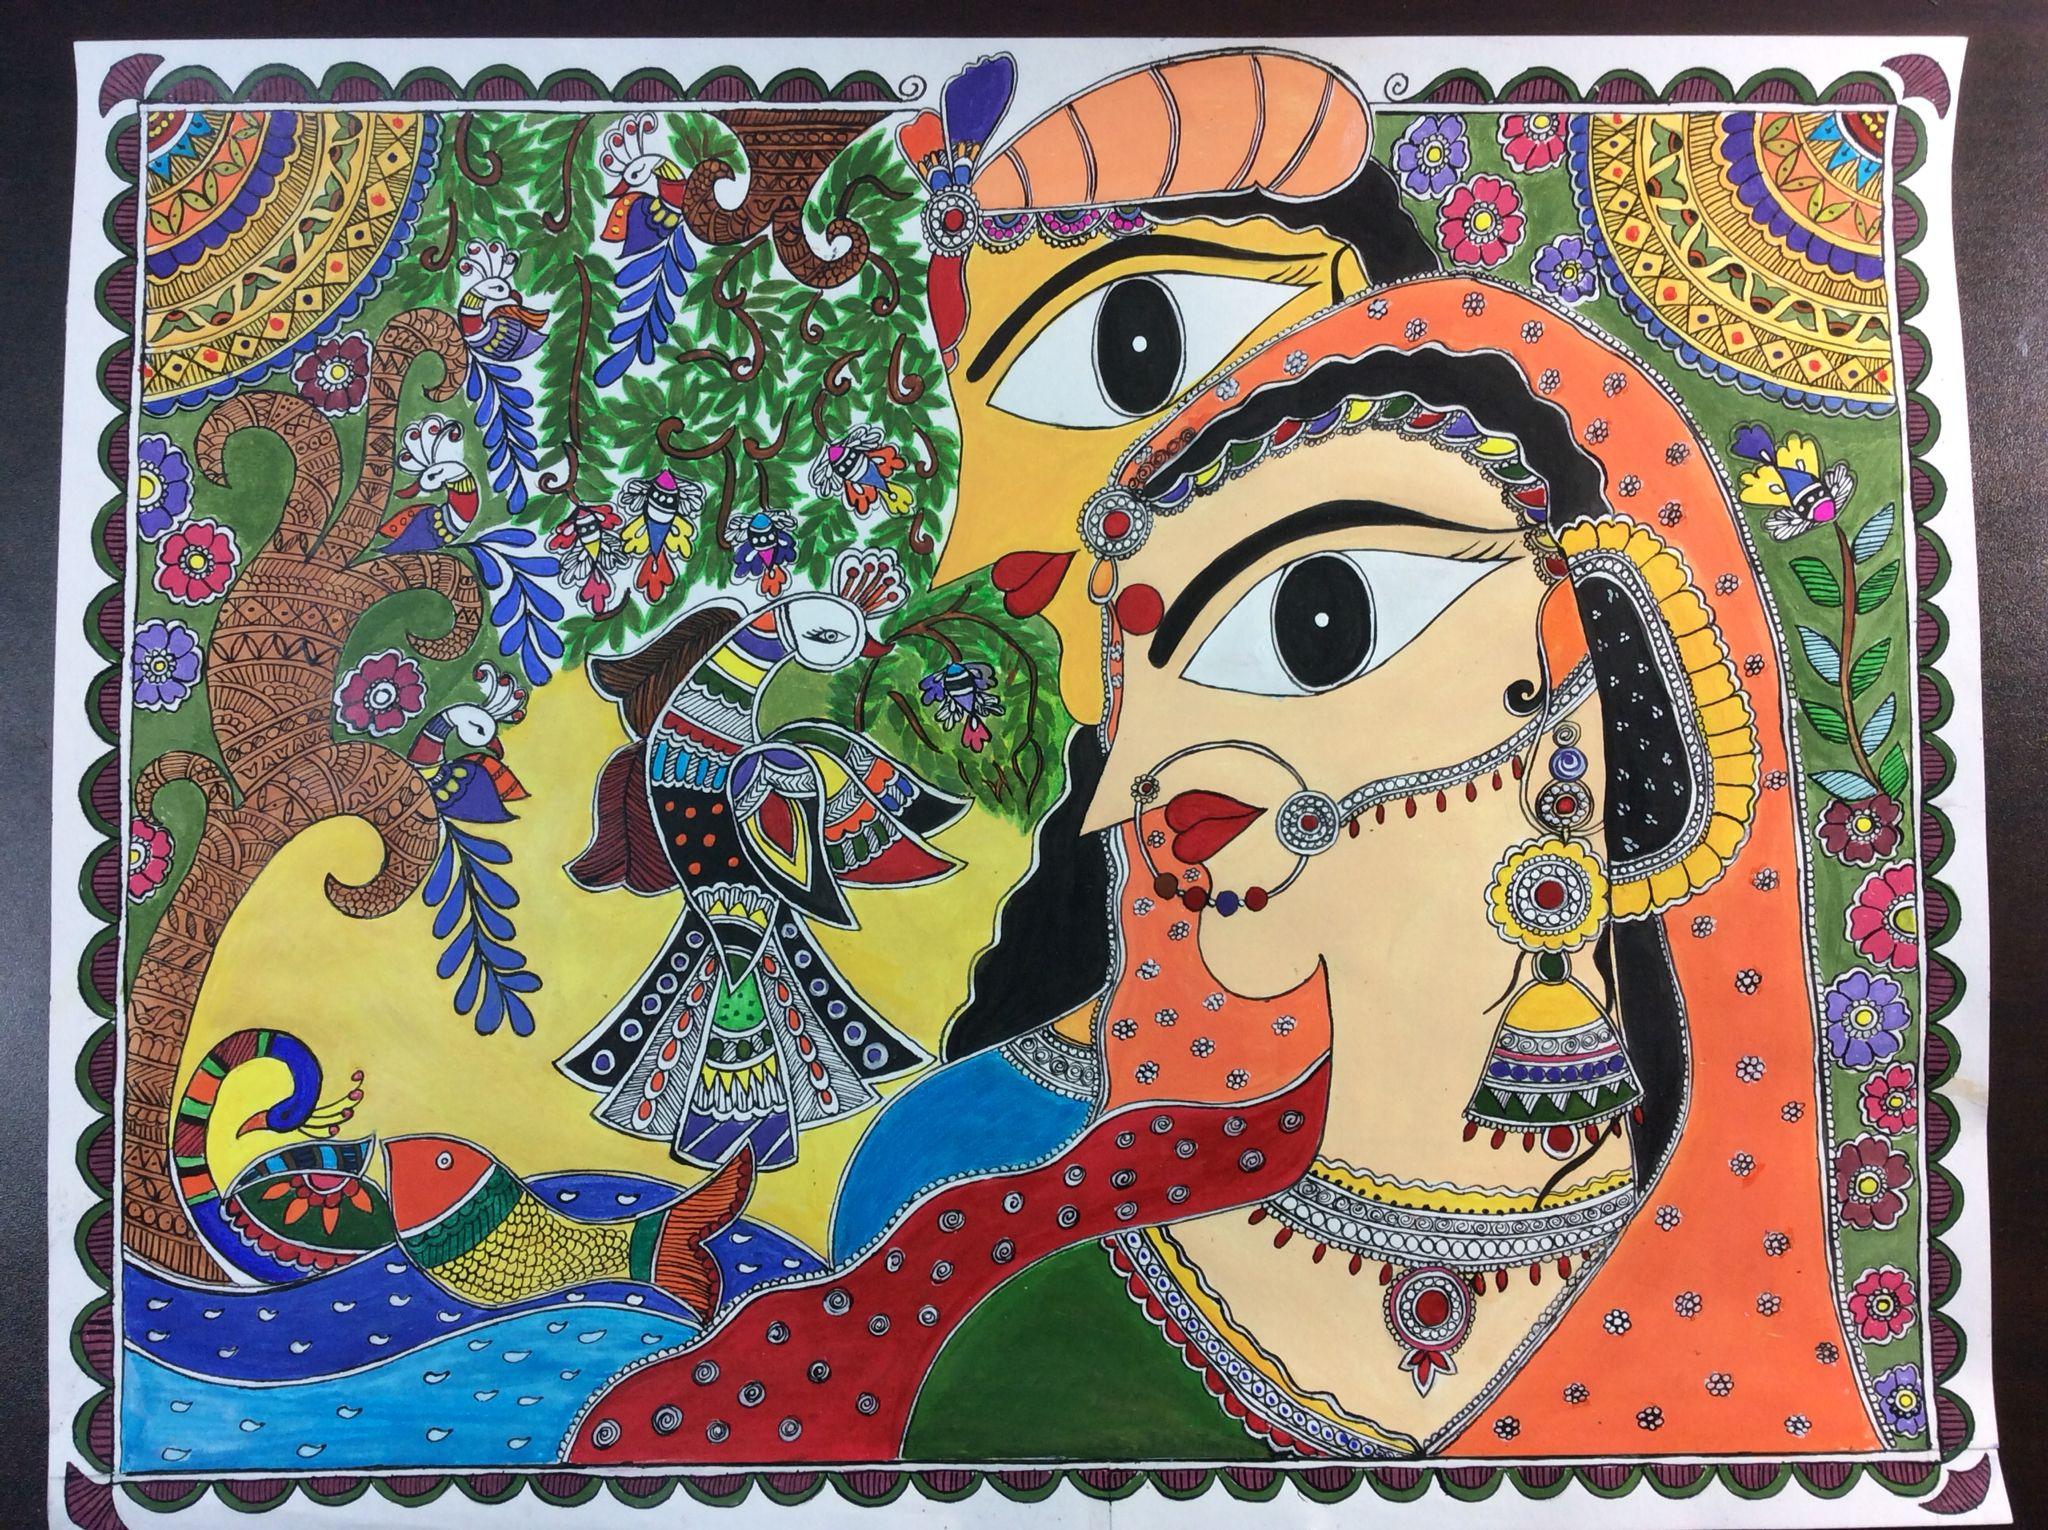 Handmade Madhubani painting with acrylic colors